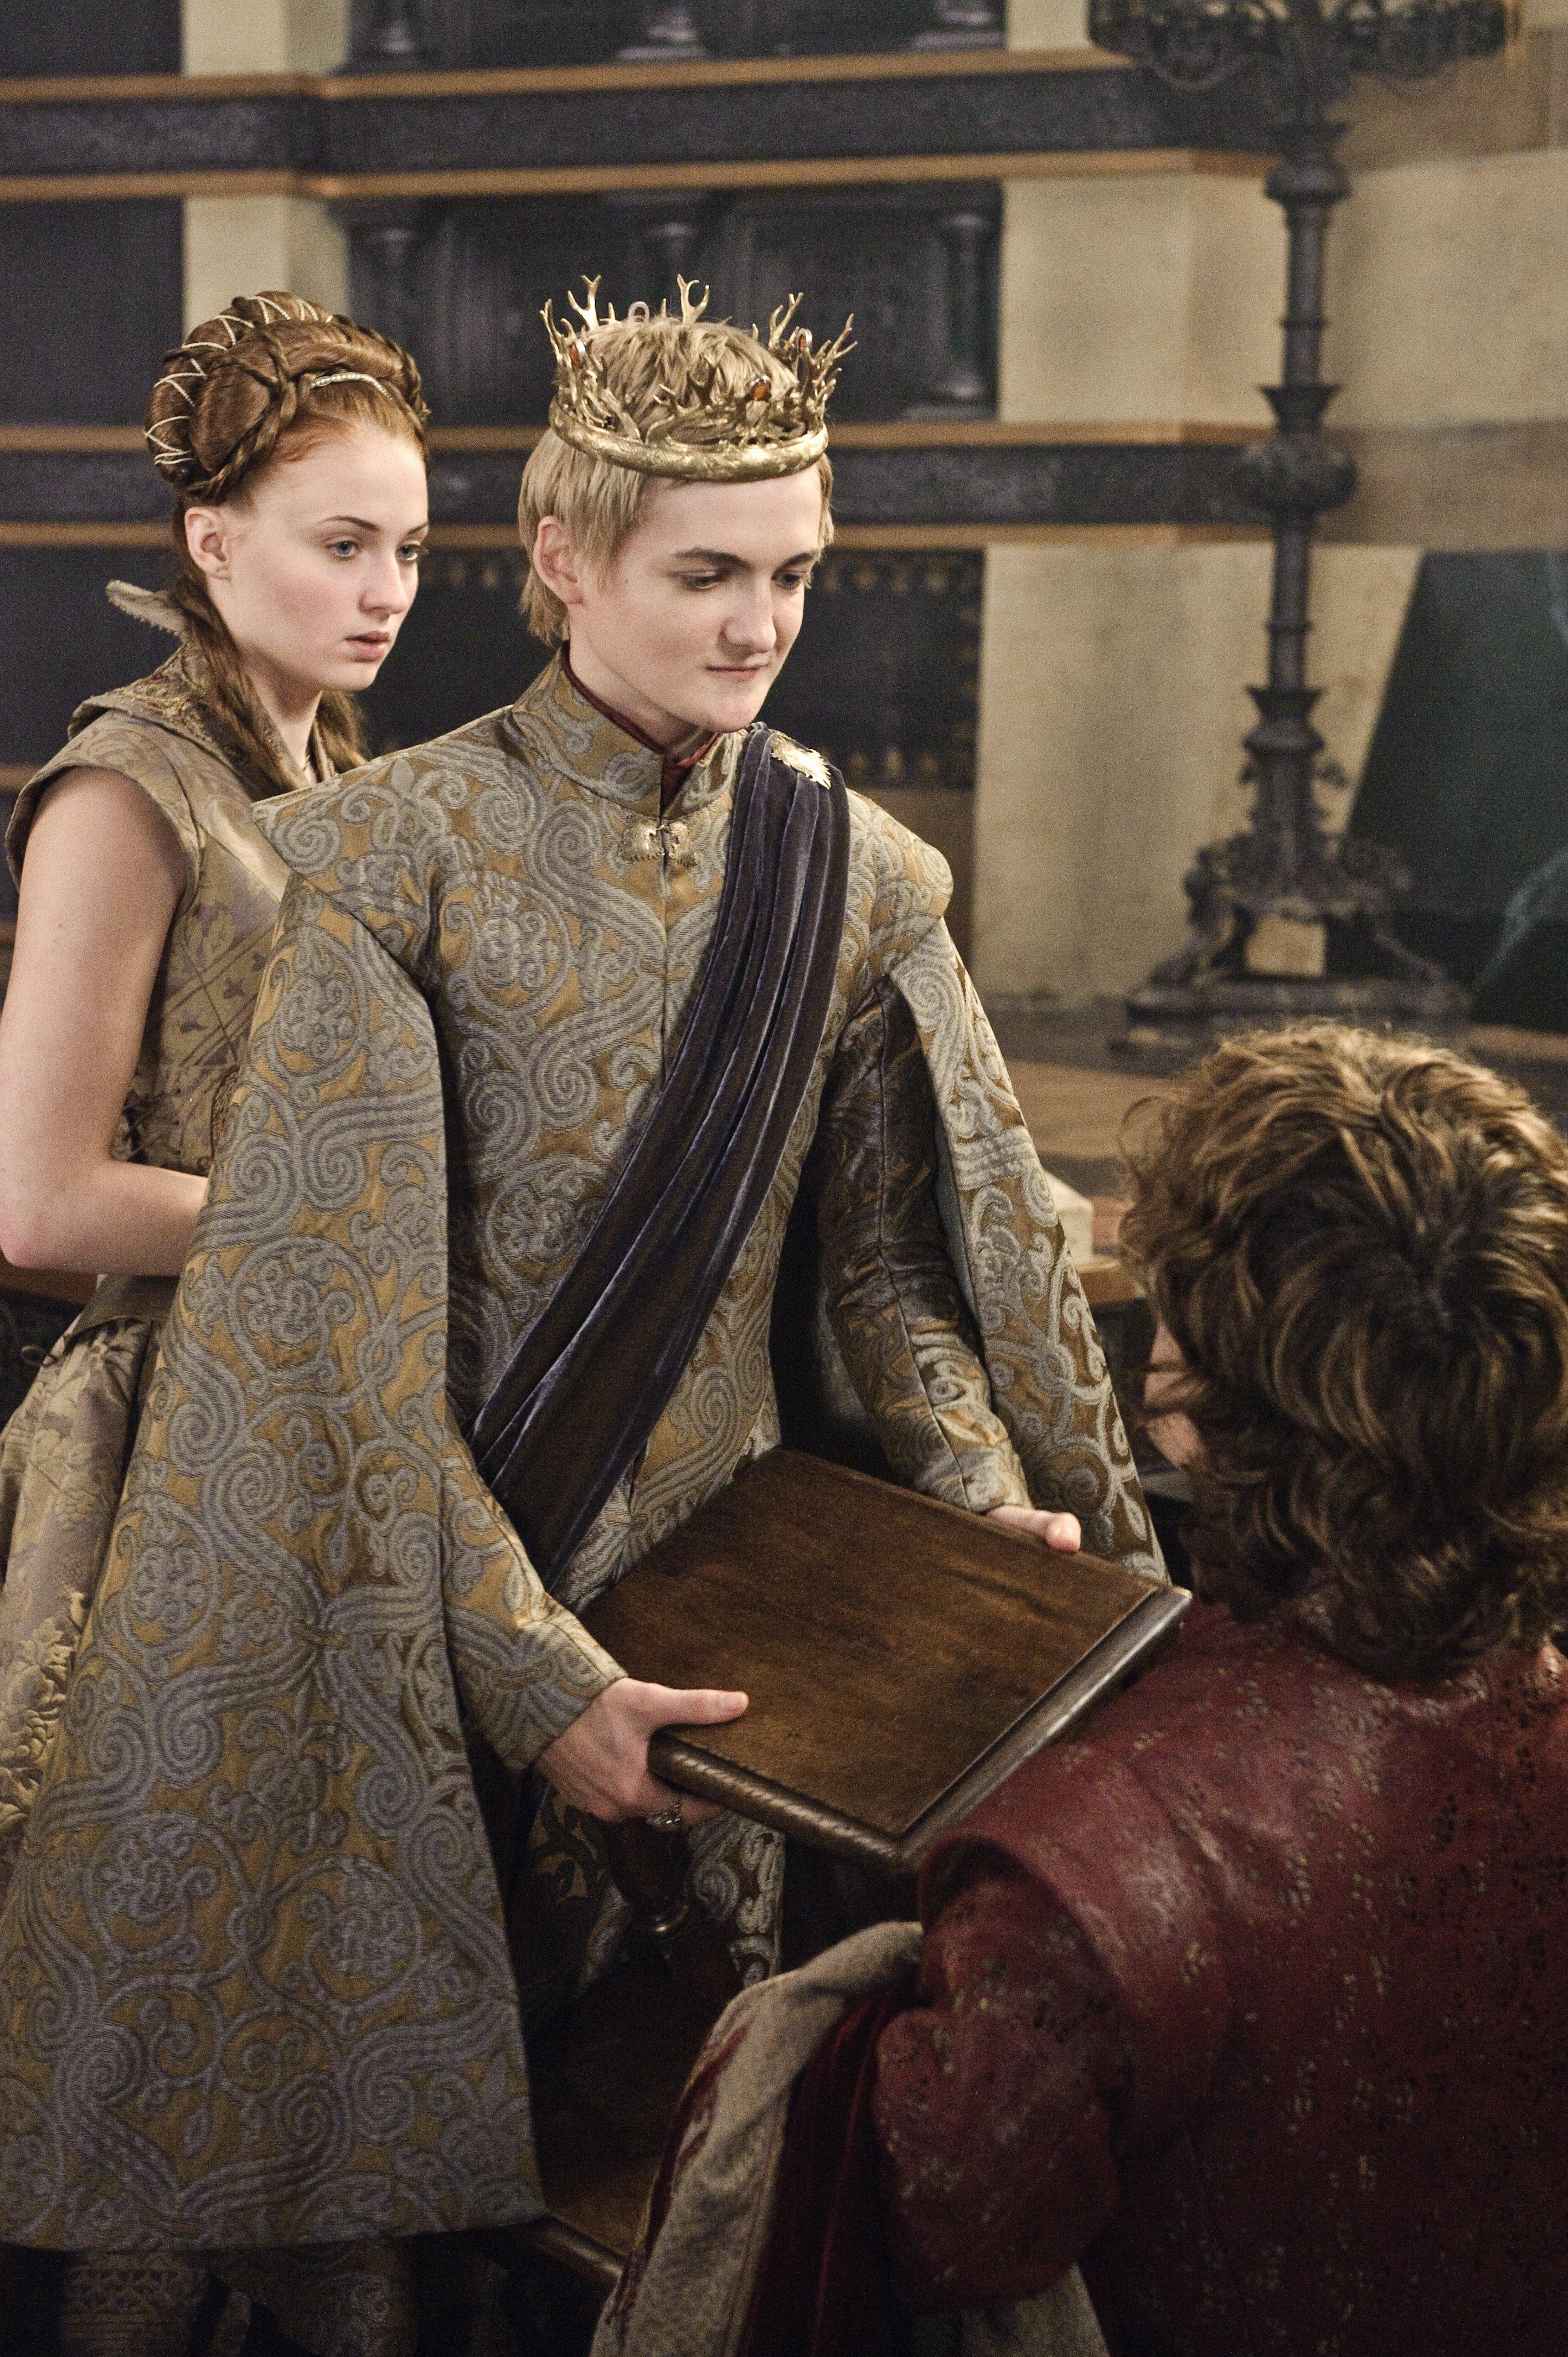 Sansa Stark, Tyrion Lannister & Joffrey Baratheon - Tyrion ...